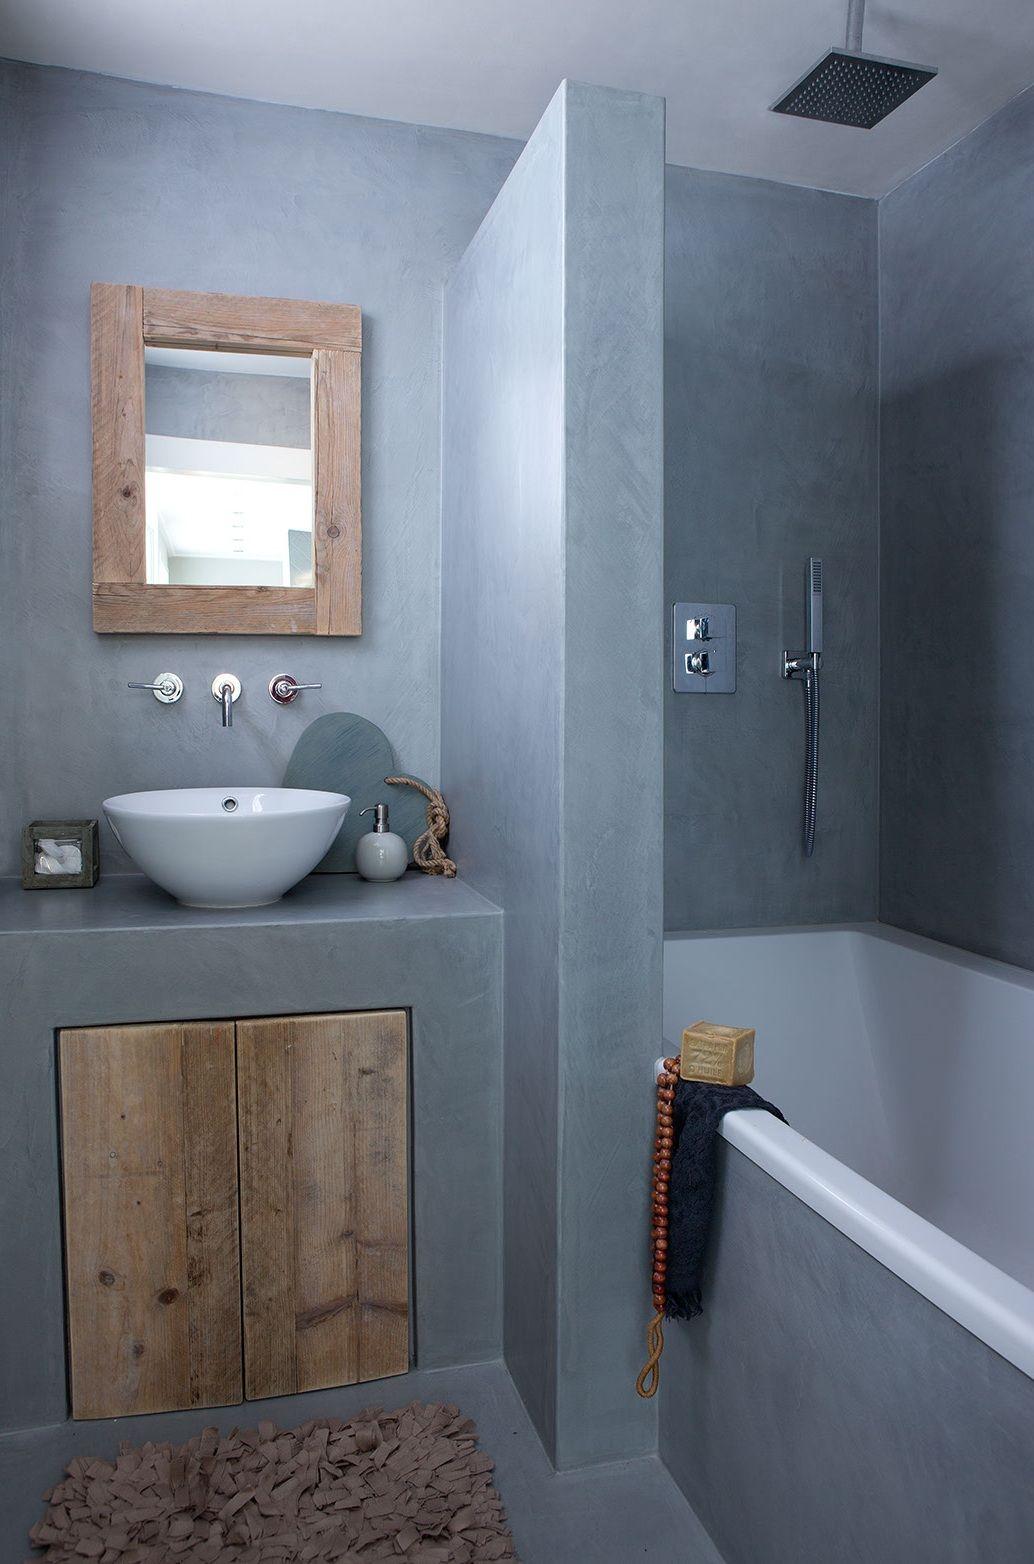 27 Tadelakt Bathroom Design Ideas | Bathroom designs